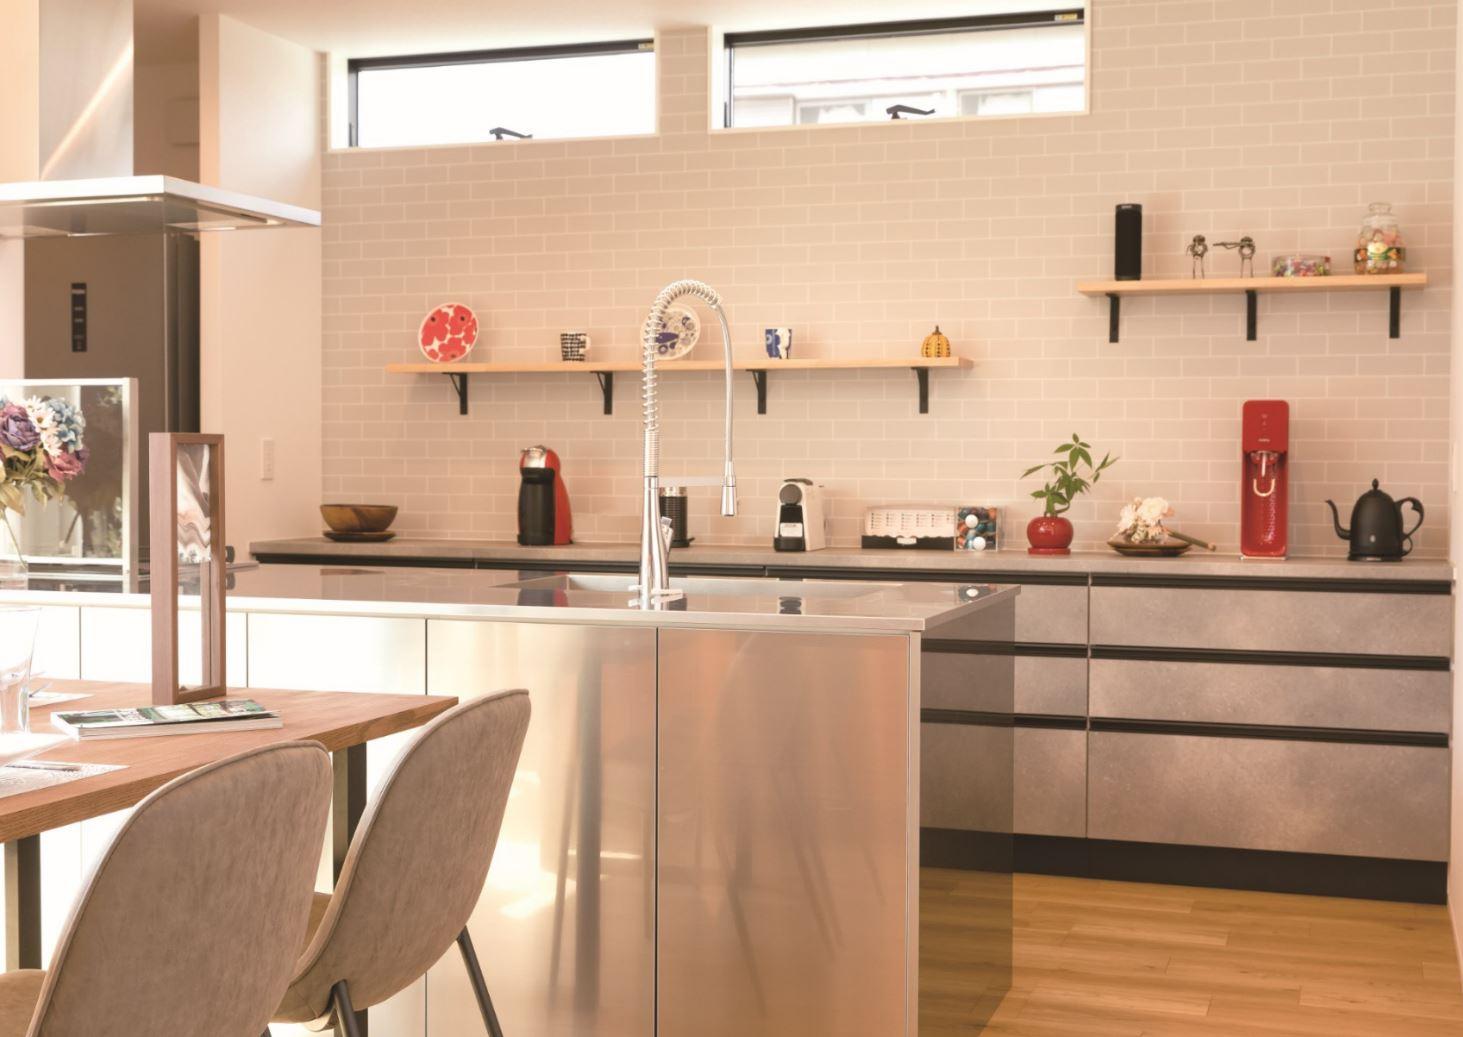 REIWA HOUSE(令和ハウス)【浜松市中区葵西2-18-21・モデルハウス】デザイン性と機能性を両立したオールステンレスのオリジナルキッチンは来場者から大好評